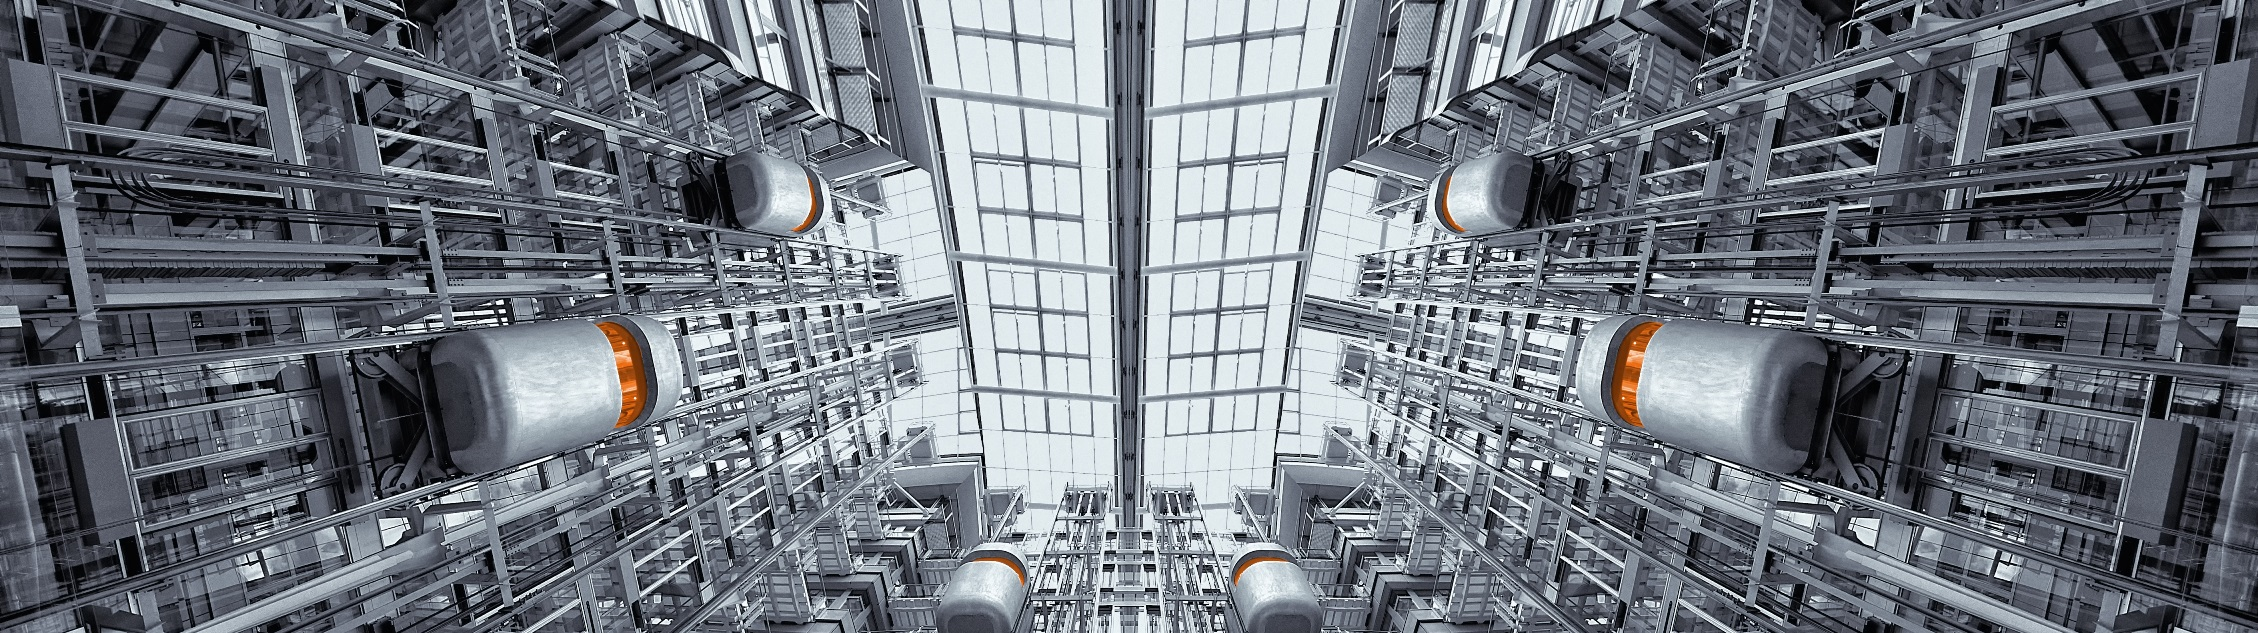 Elevator_Lueneburg